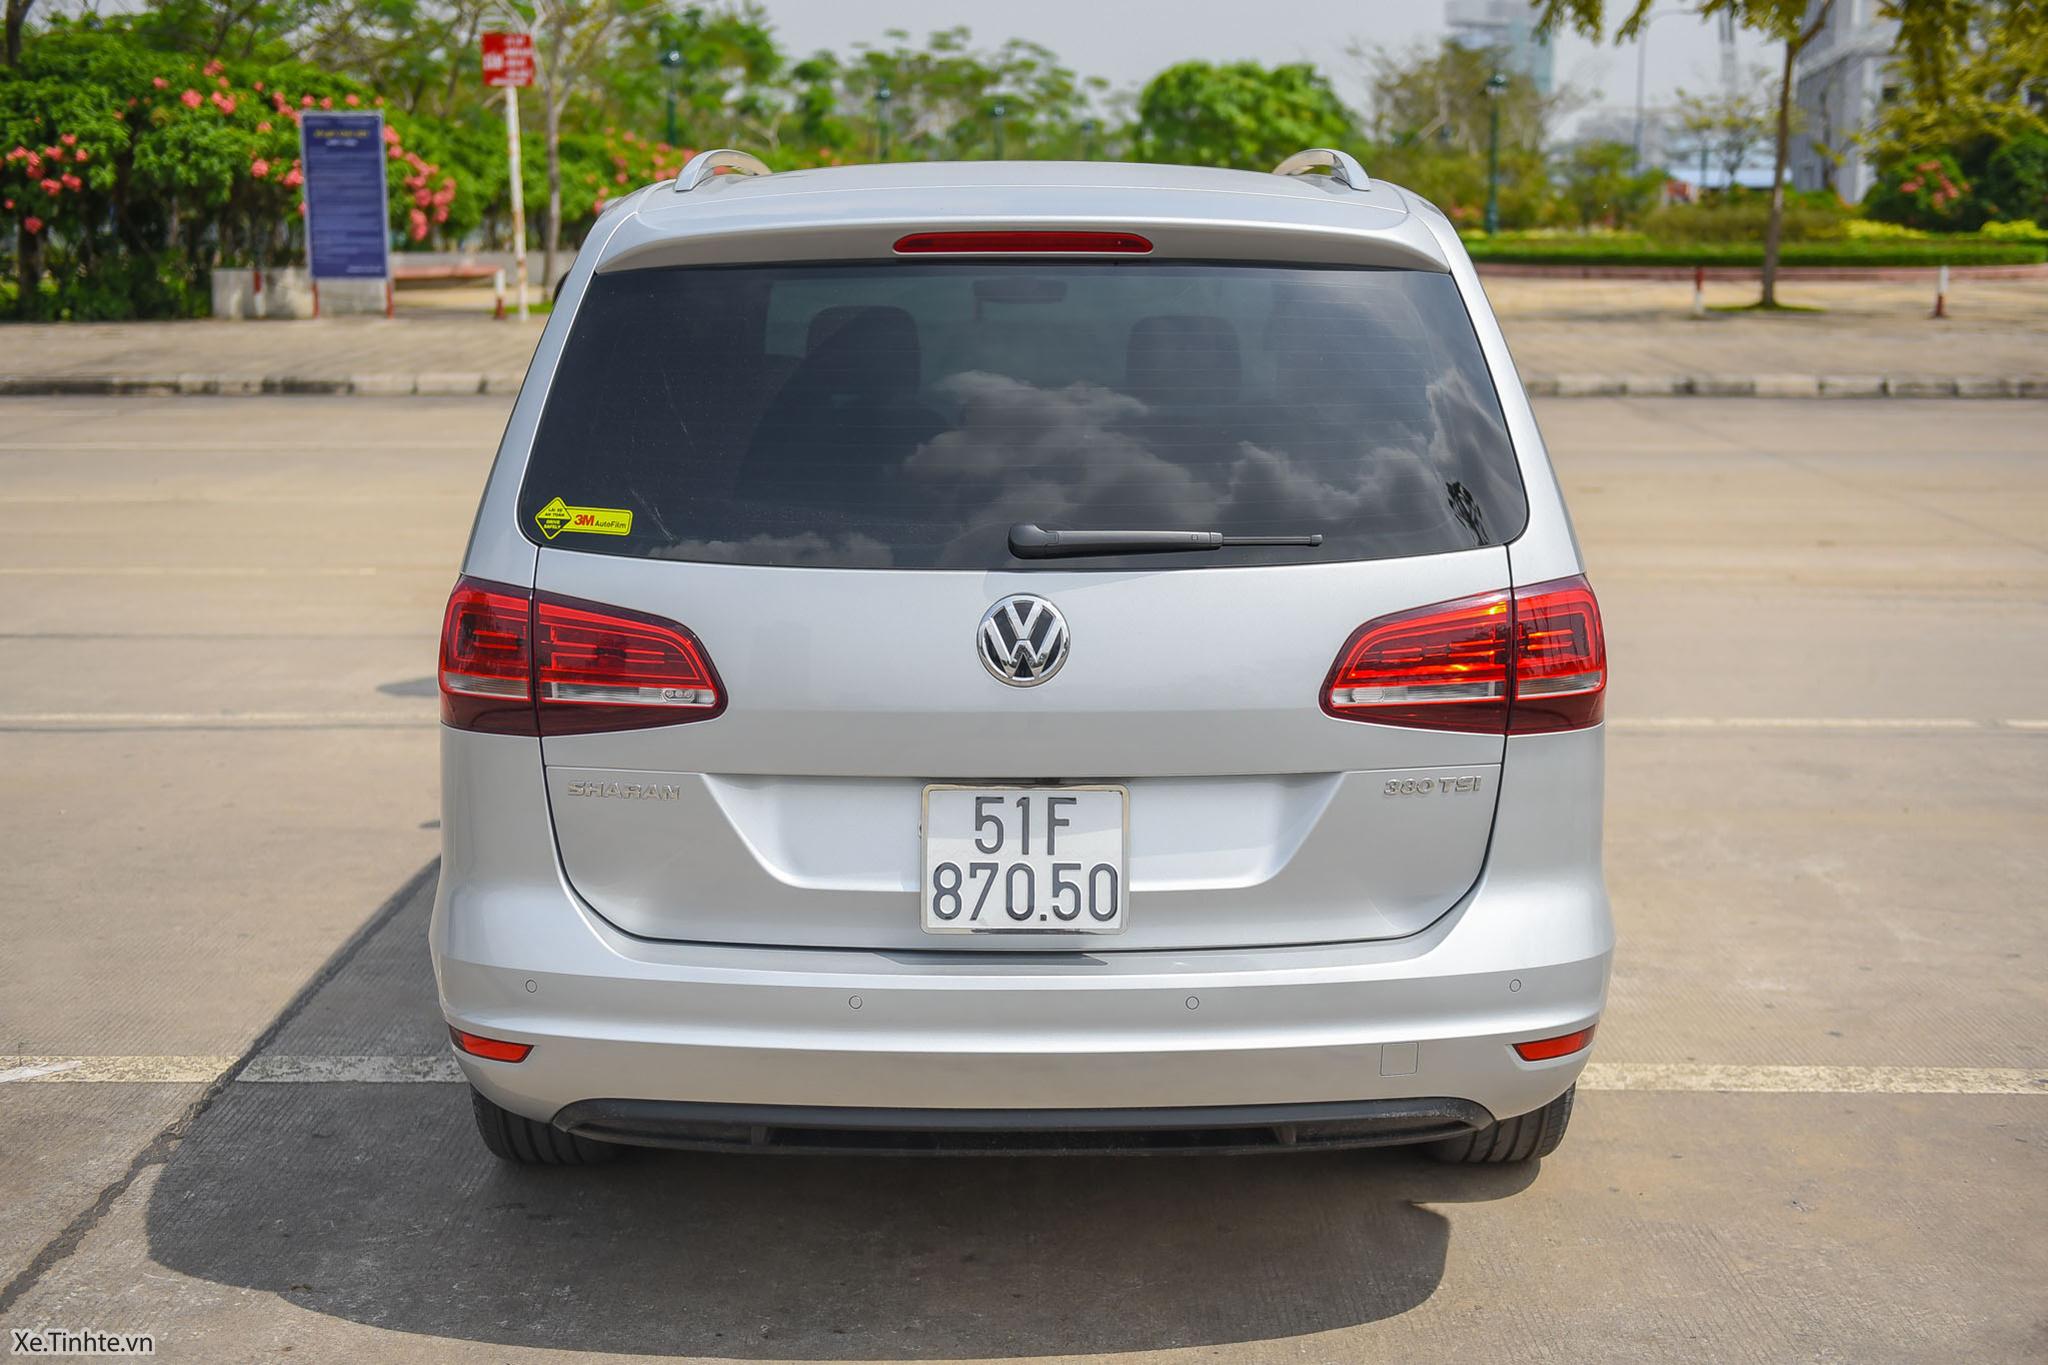 Volkswagen_Sharan_Xe_Tinhte_112.jpg